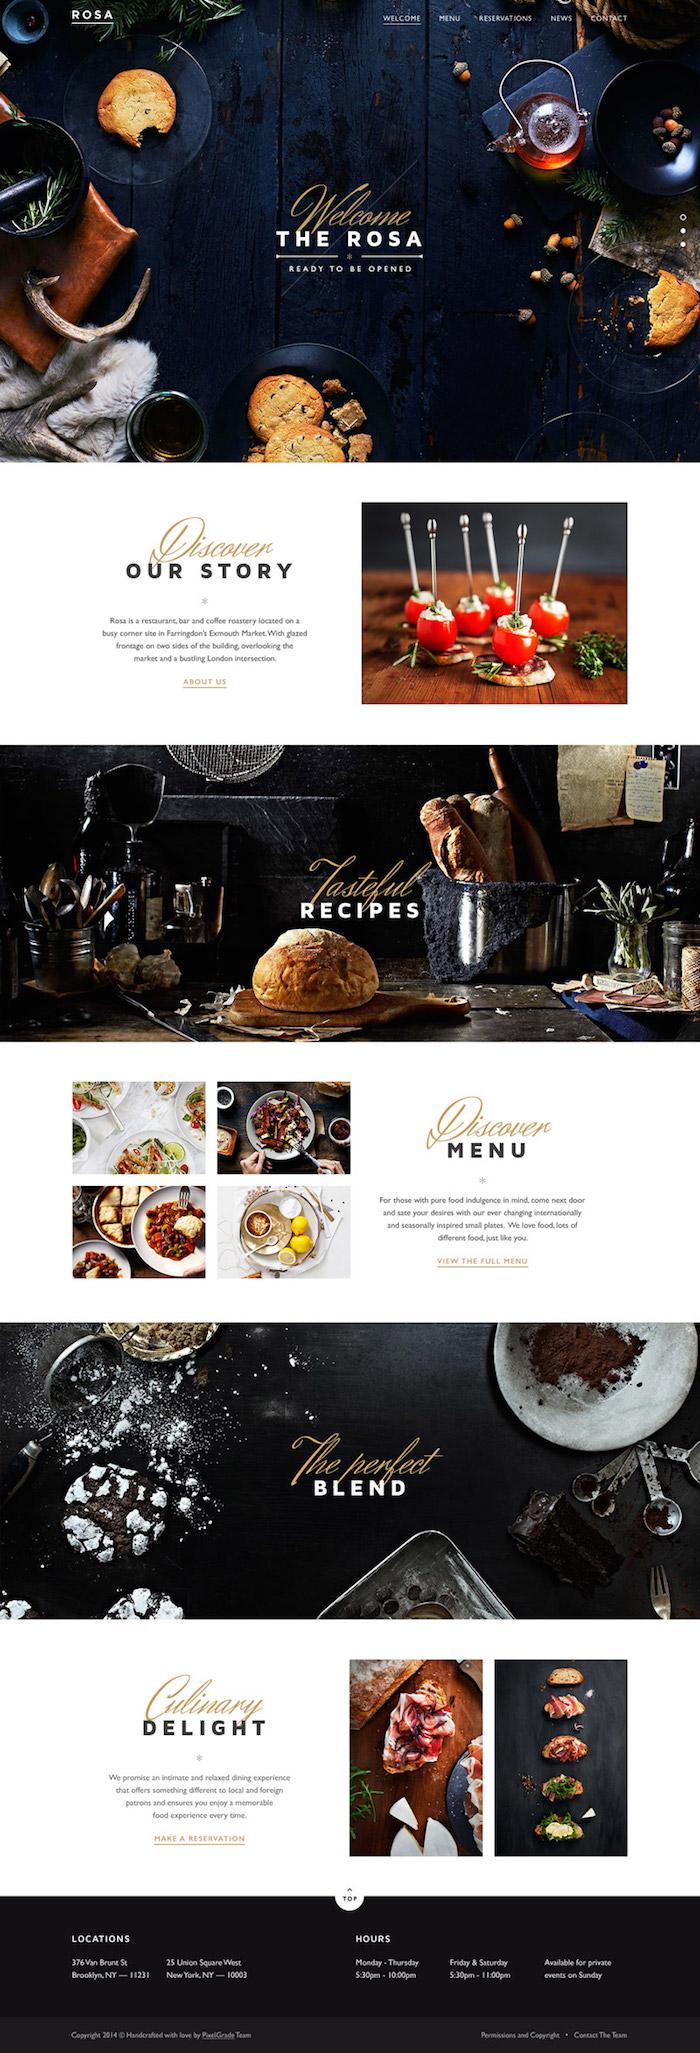 diseños web diciembre 2014 img 2